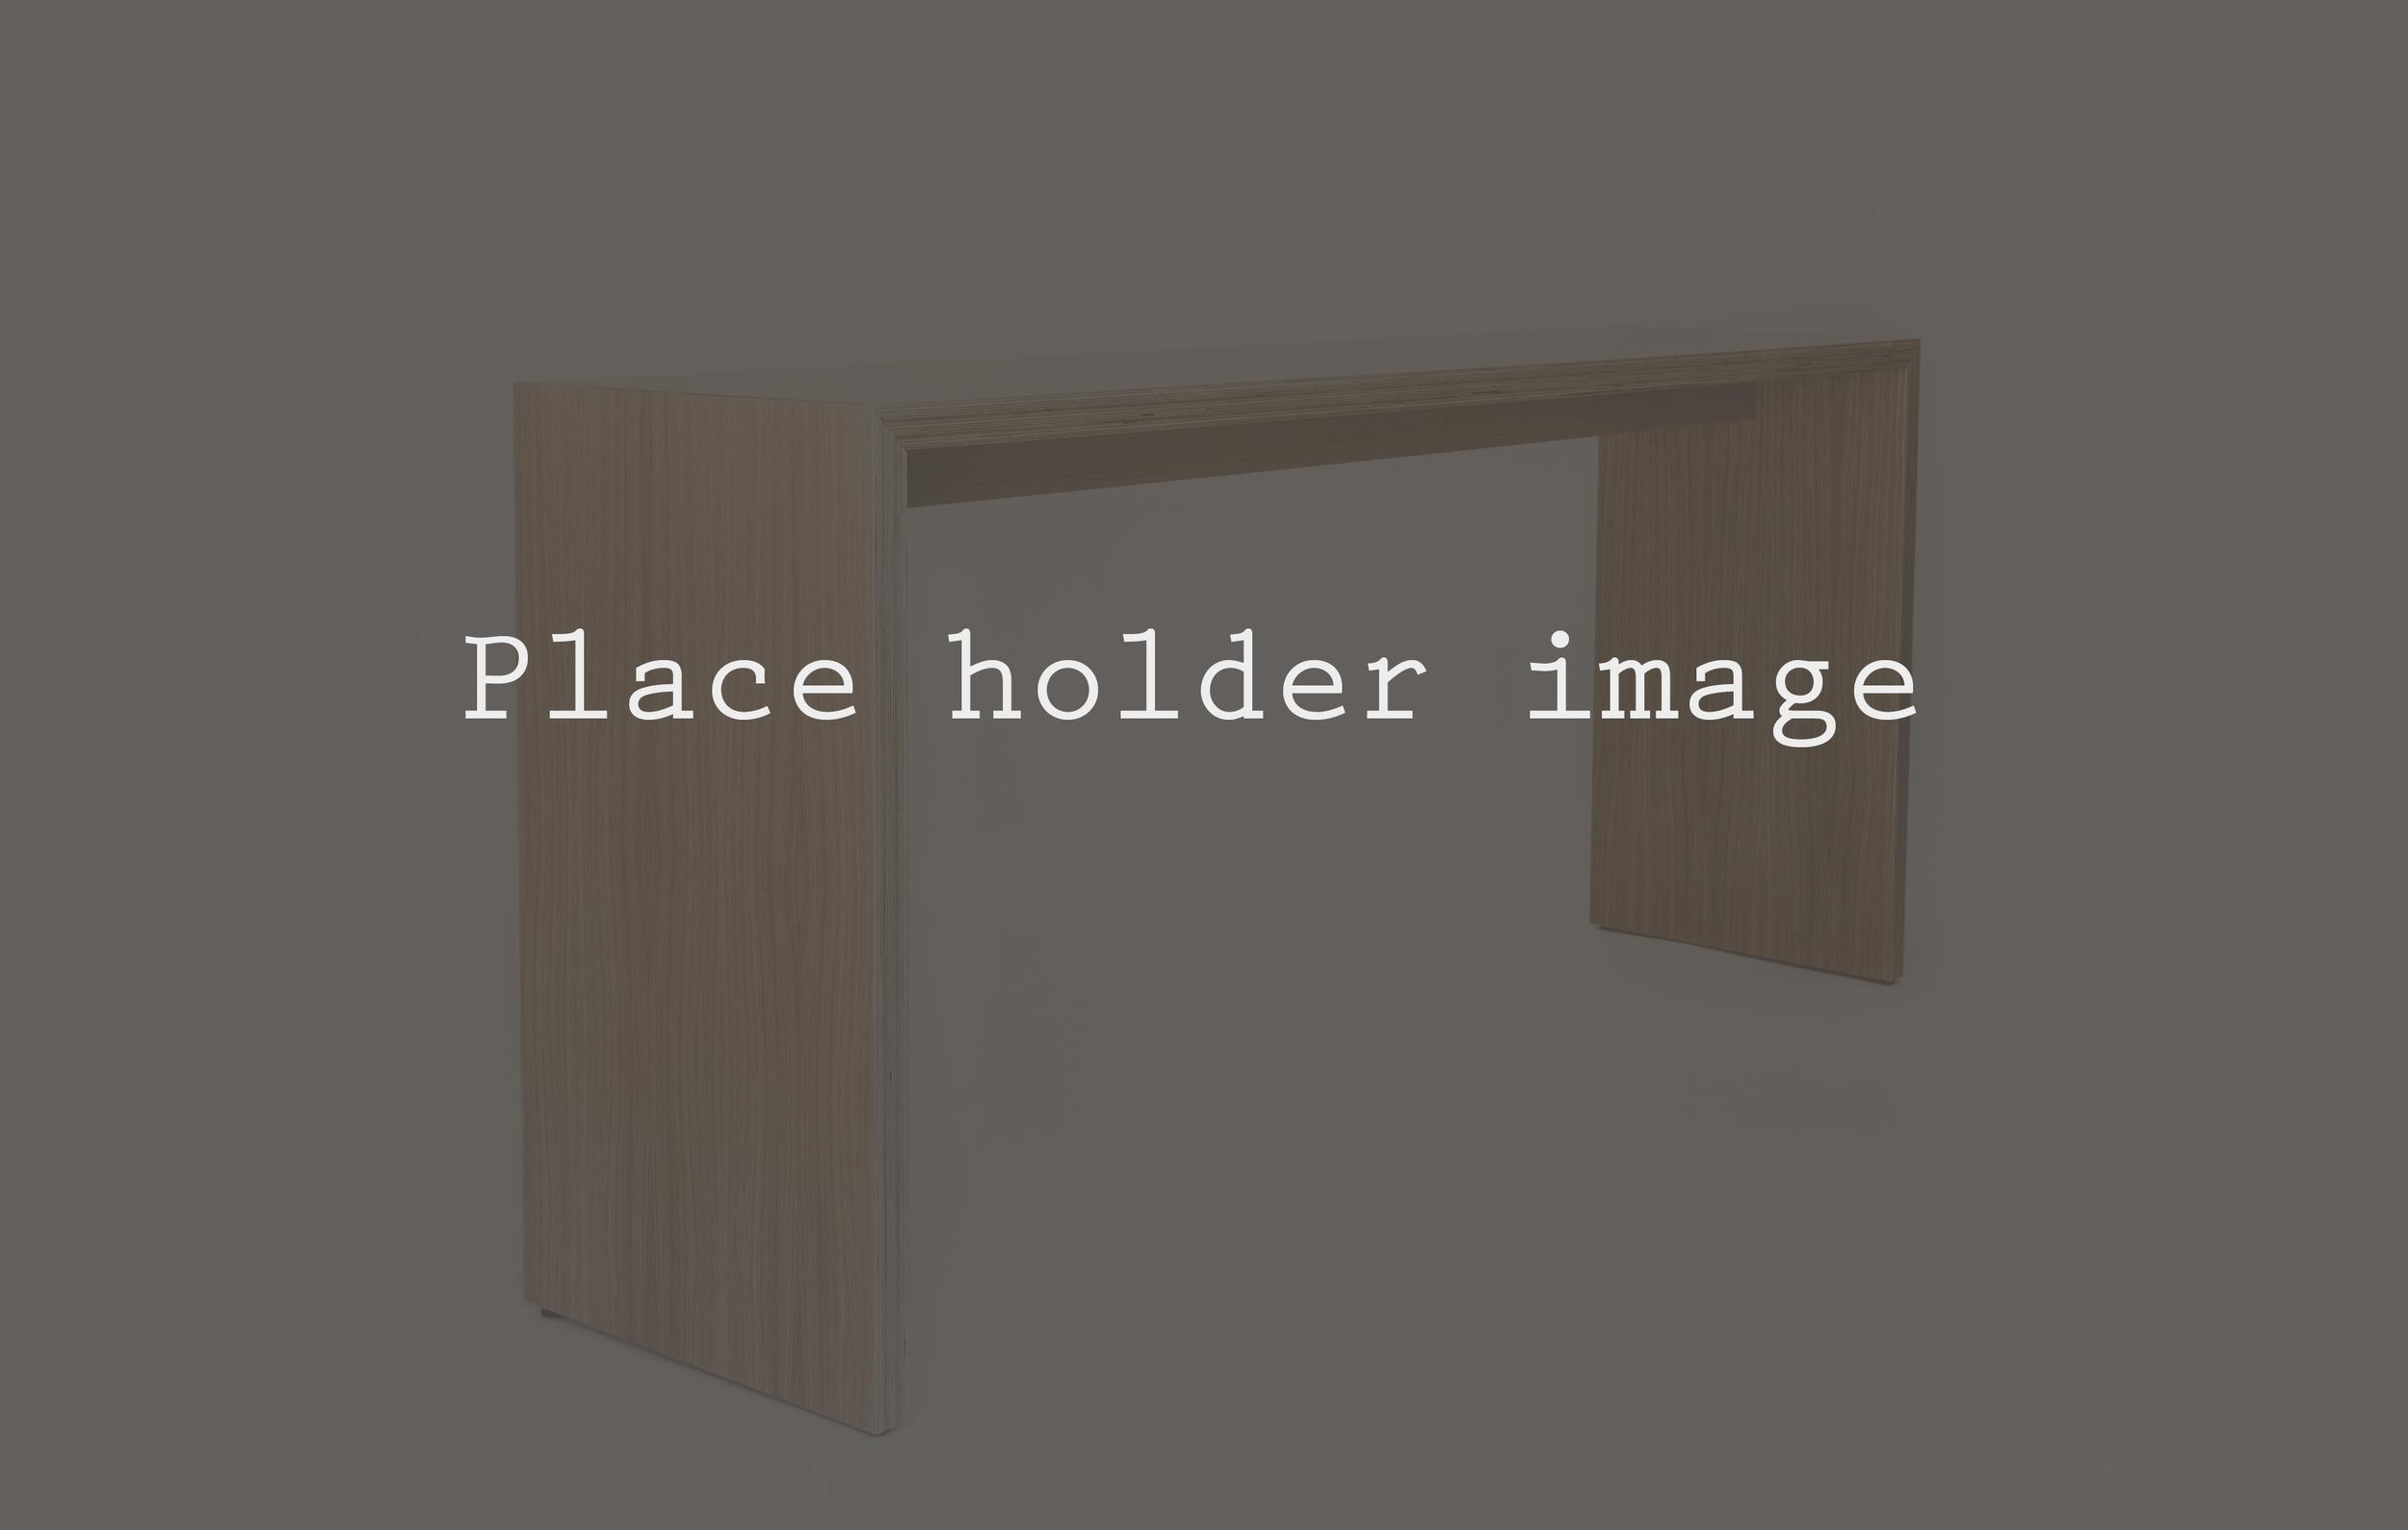 place holder image 1.jpg